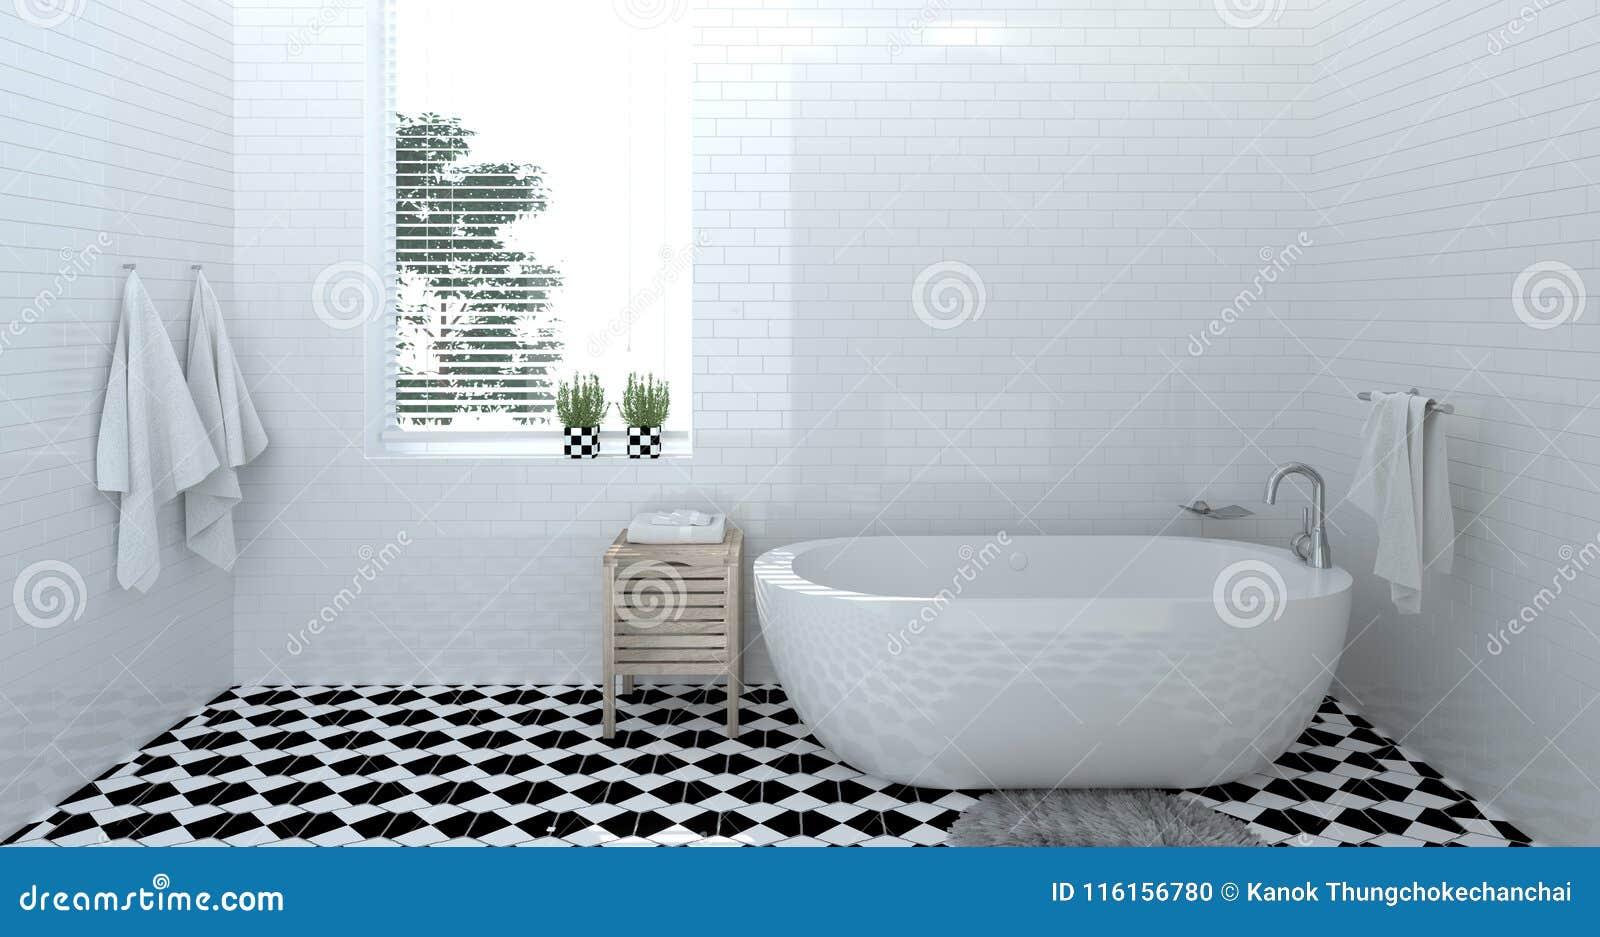 Empty bathroom interior,toilet,shower,modern home design 3d rendering for copy space background white tile bathroom